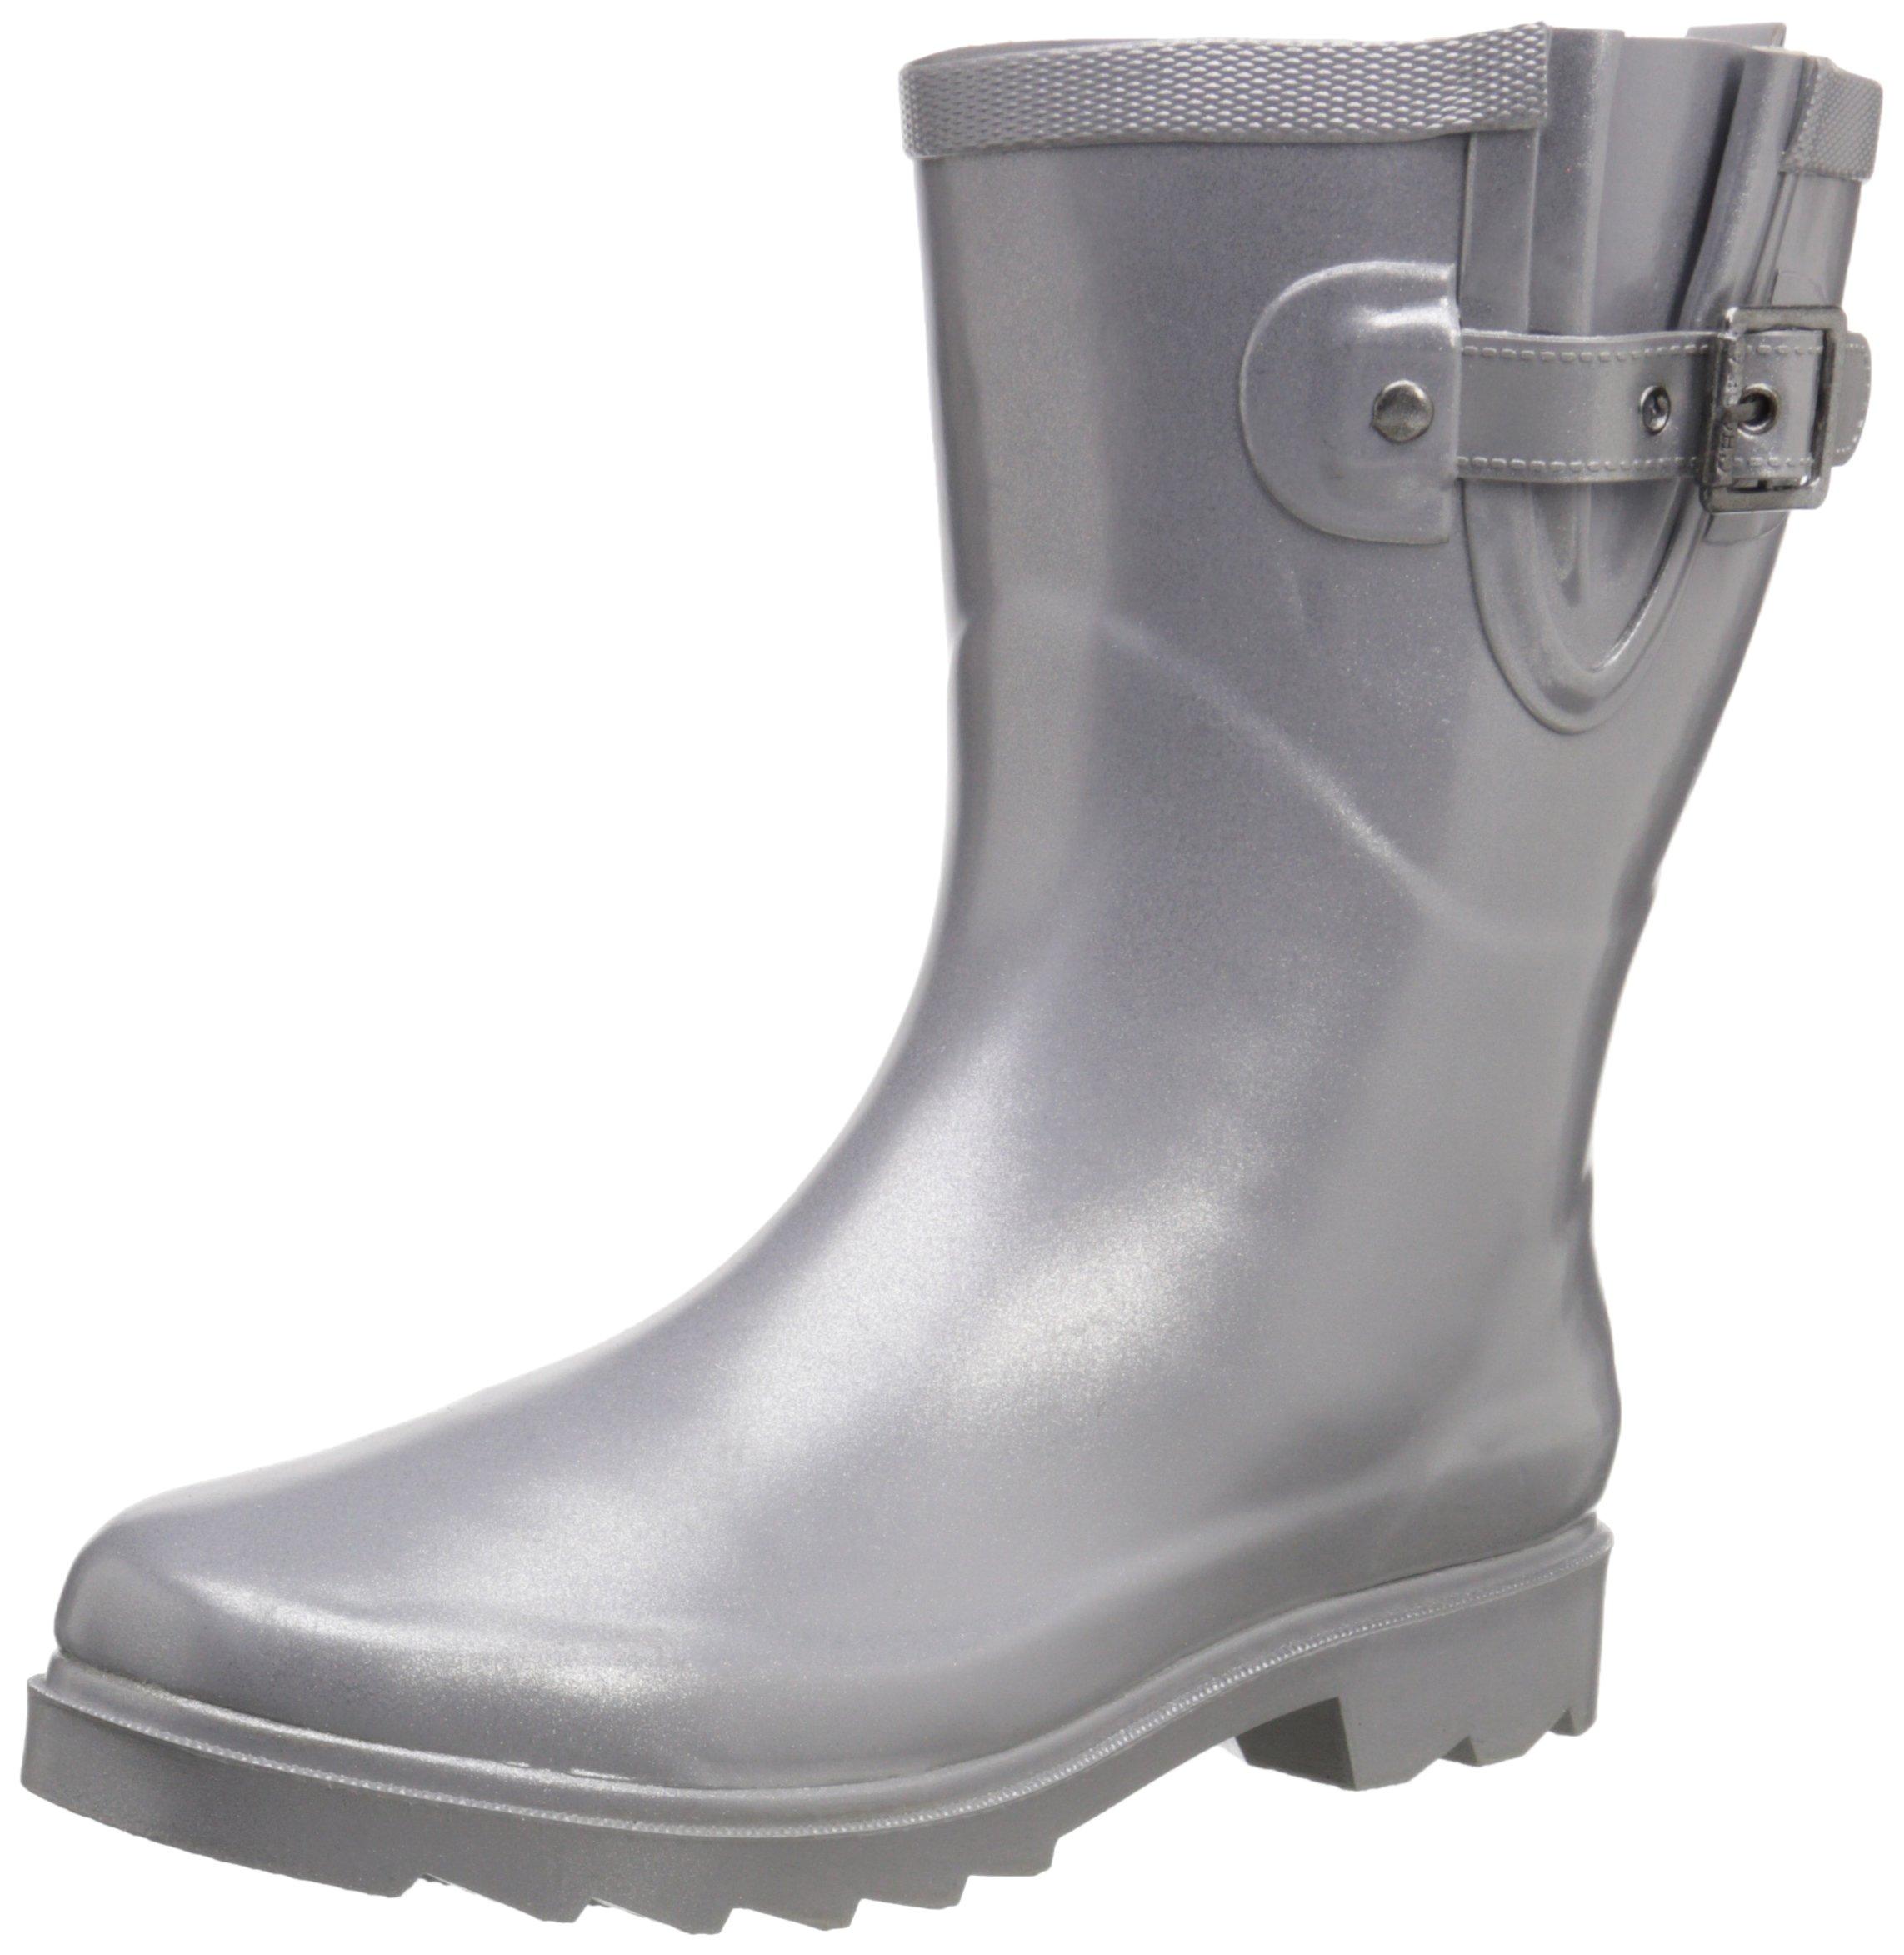 Chooka Women's Mid-Height Rain Boot, Silver, 10 M US